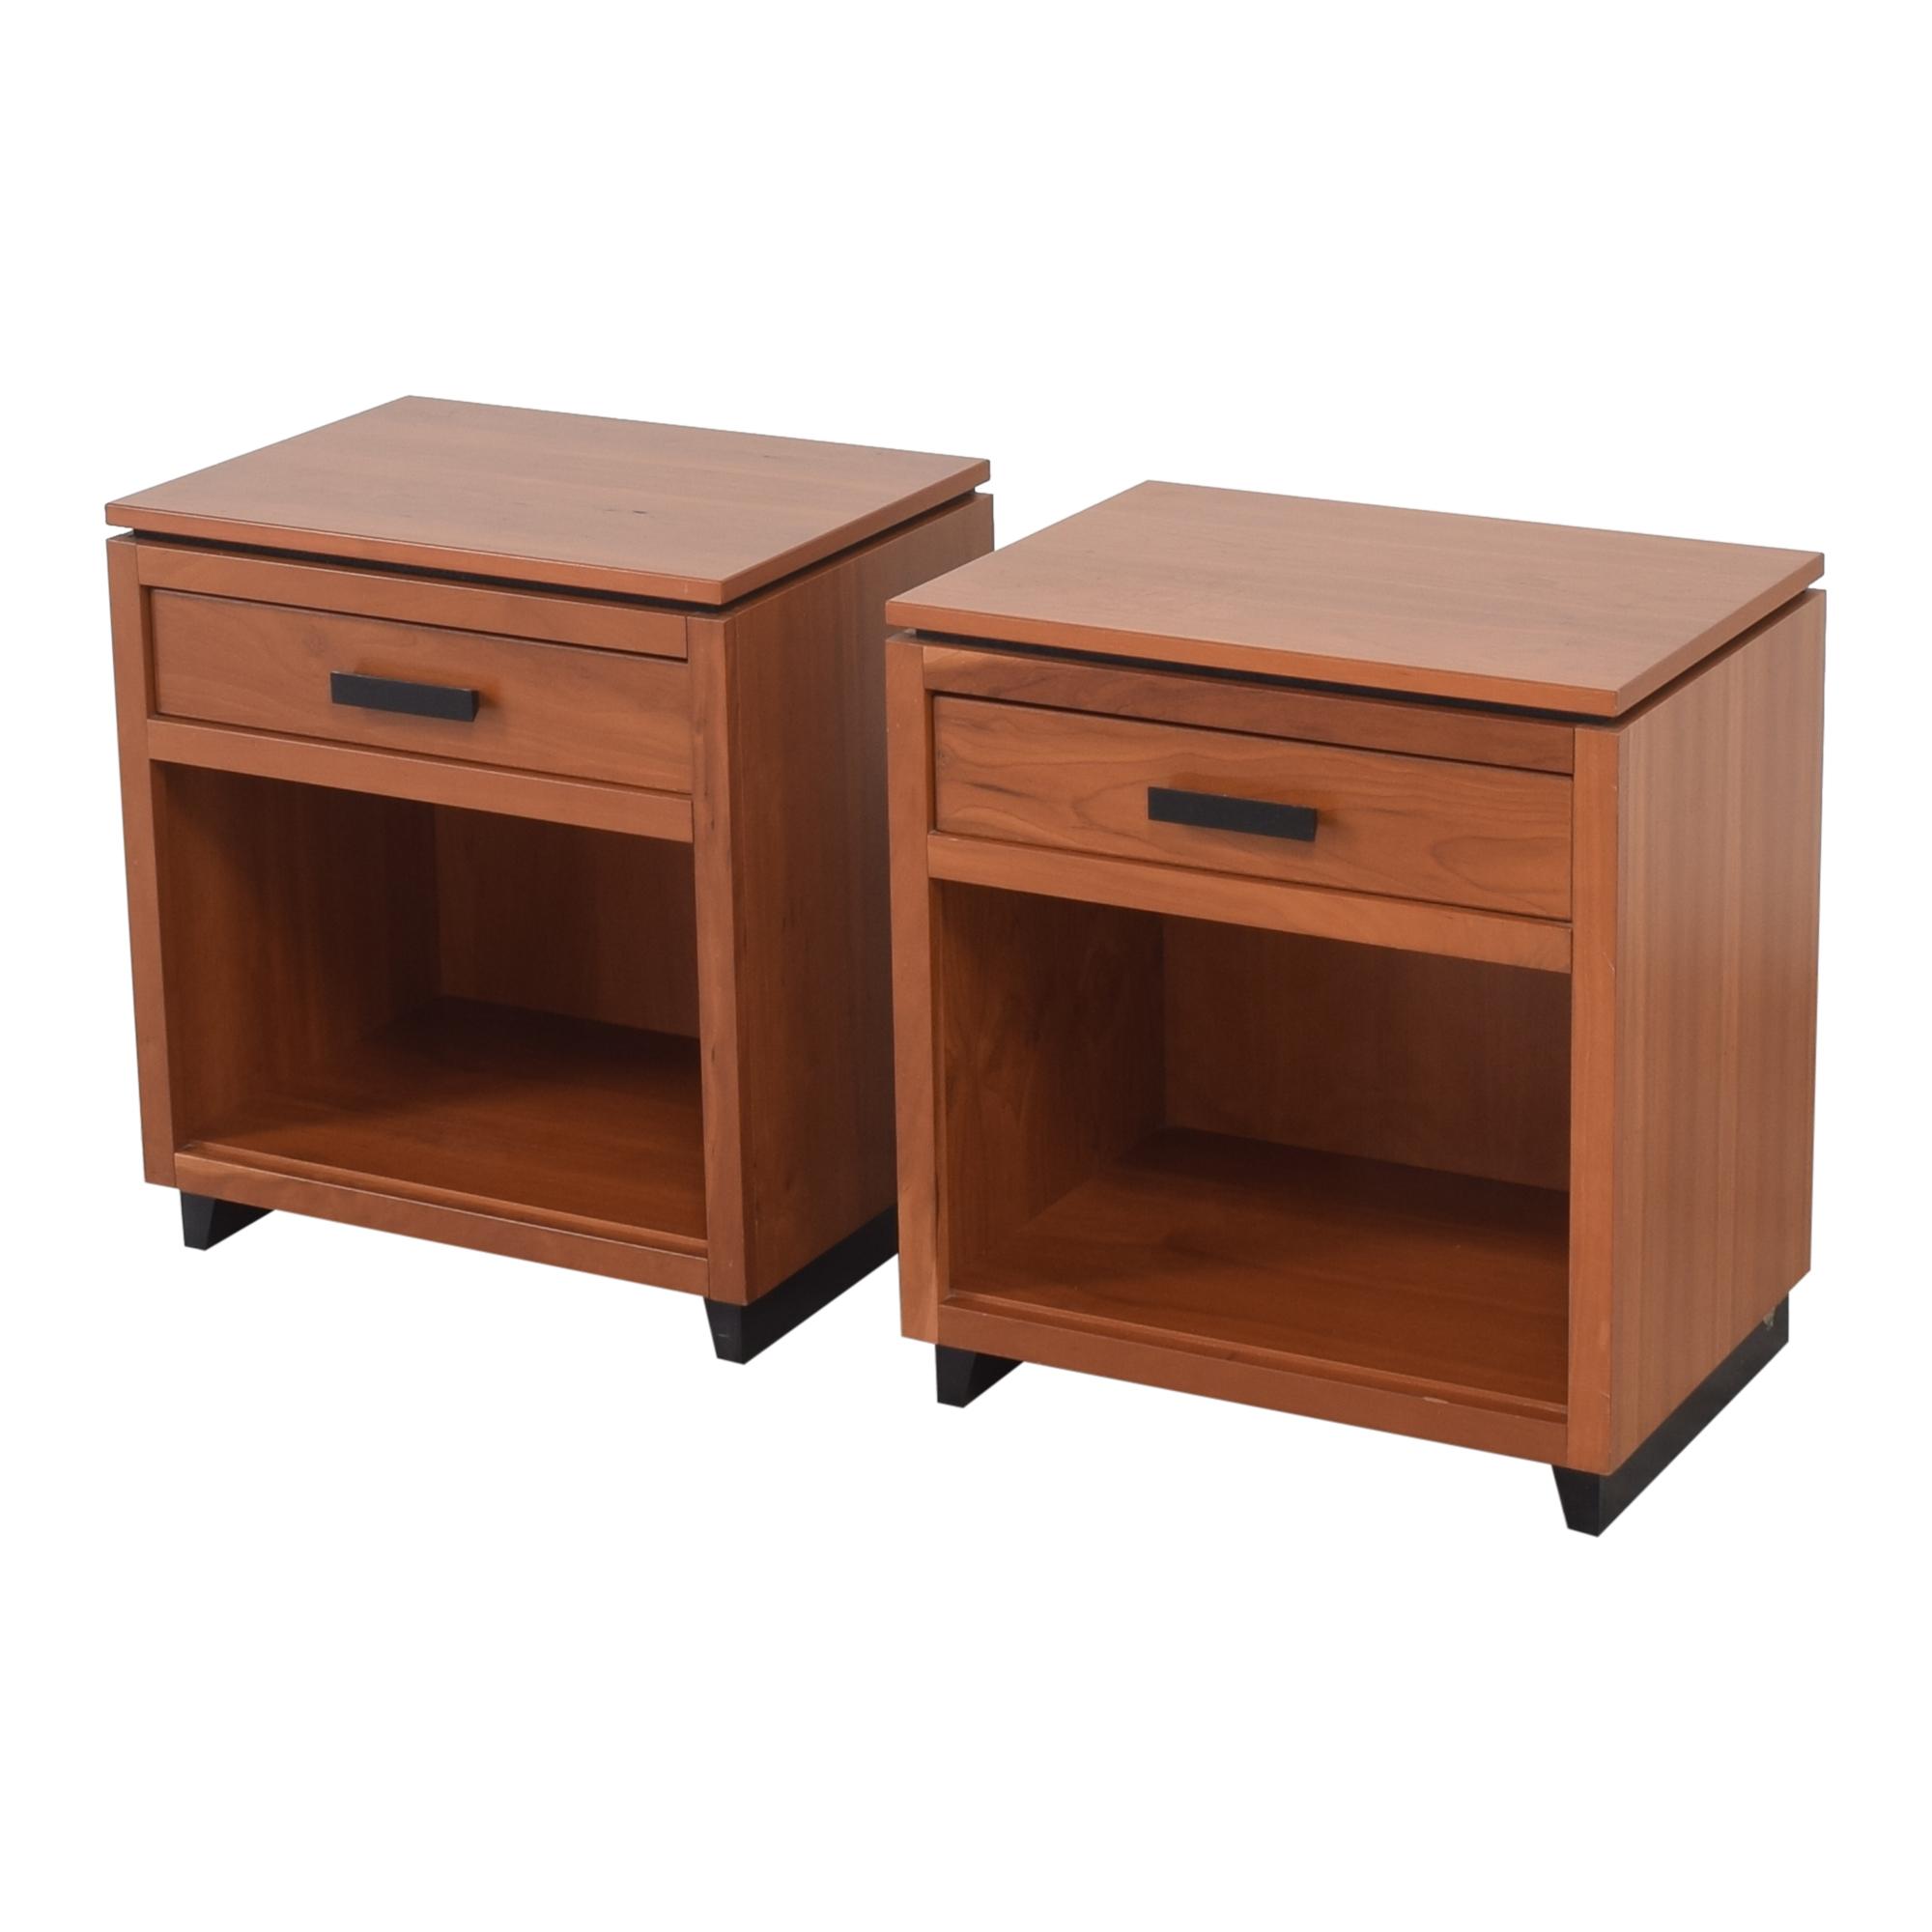 buy Workbench Single Drawer Nightstands Workbench Tables